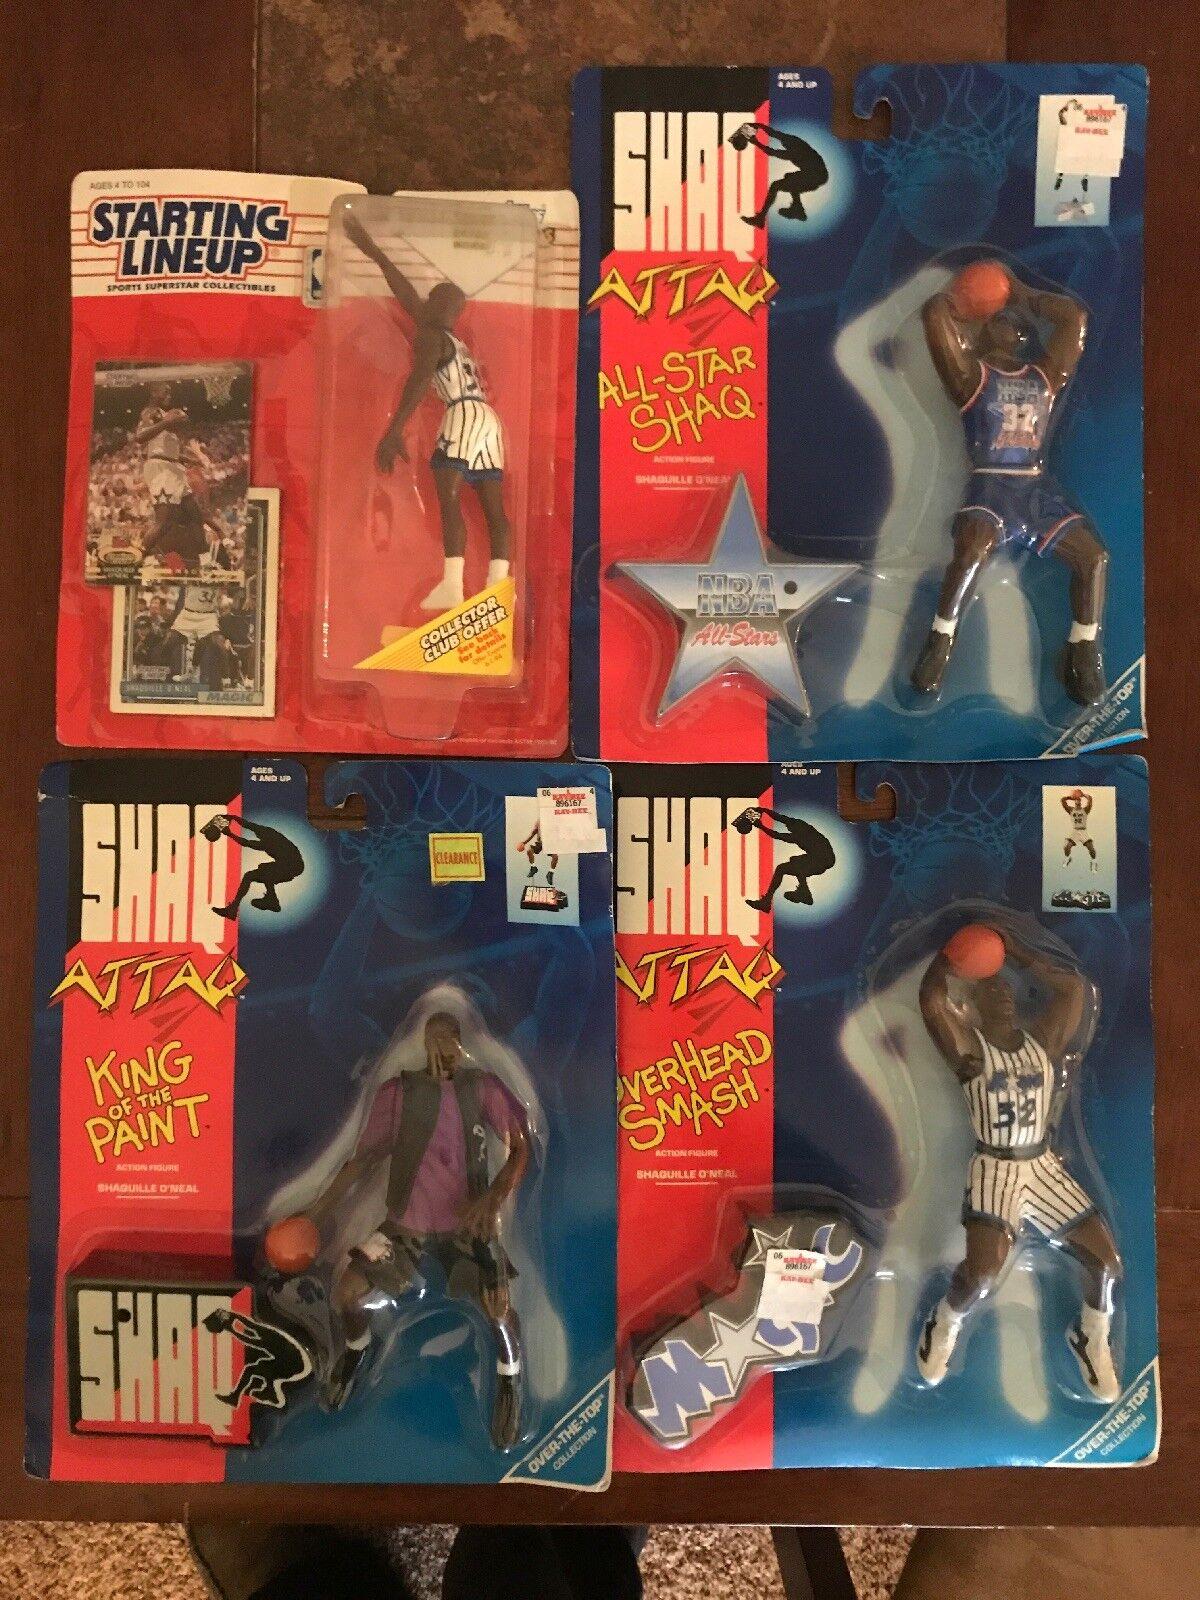 Shaquille O'Neal Figure Lot Kenner Starting Line Up Rookie 1993 Shaq Attaq